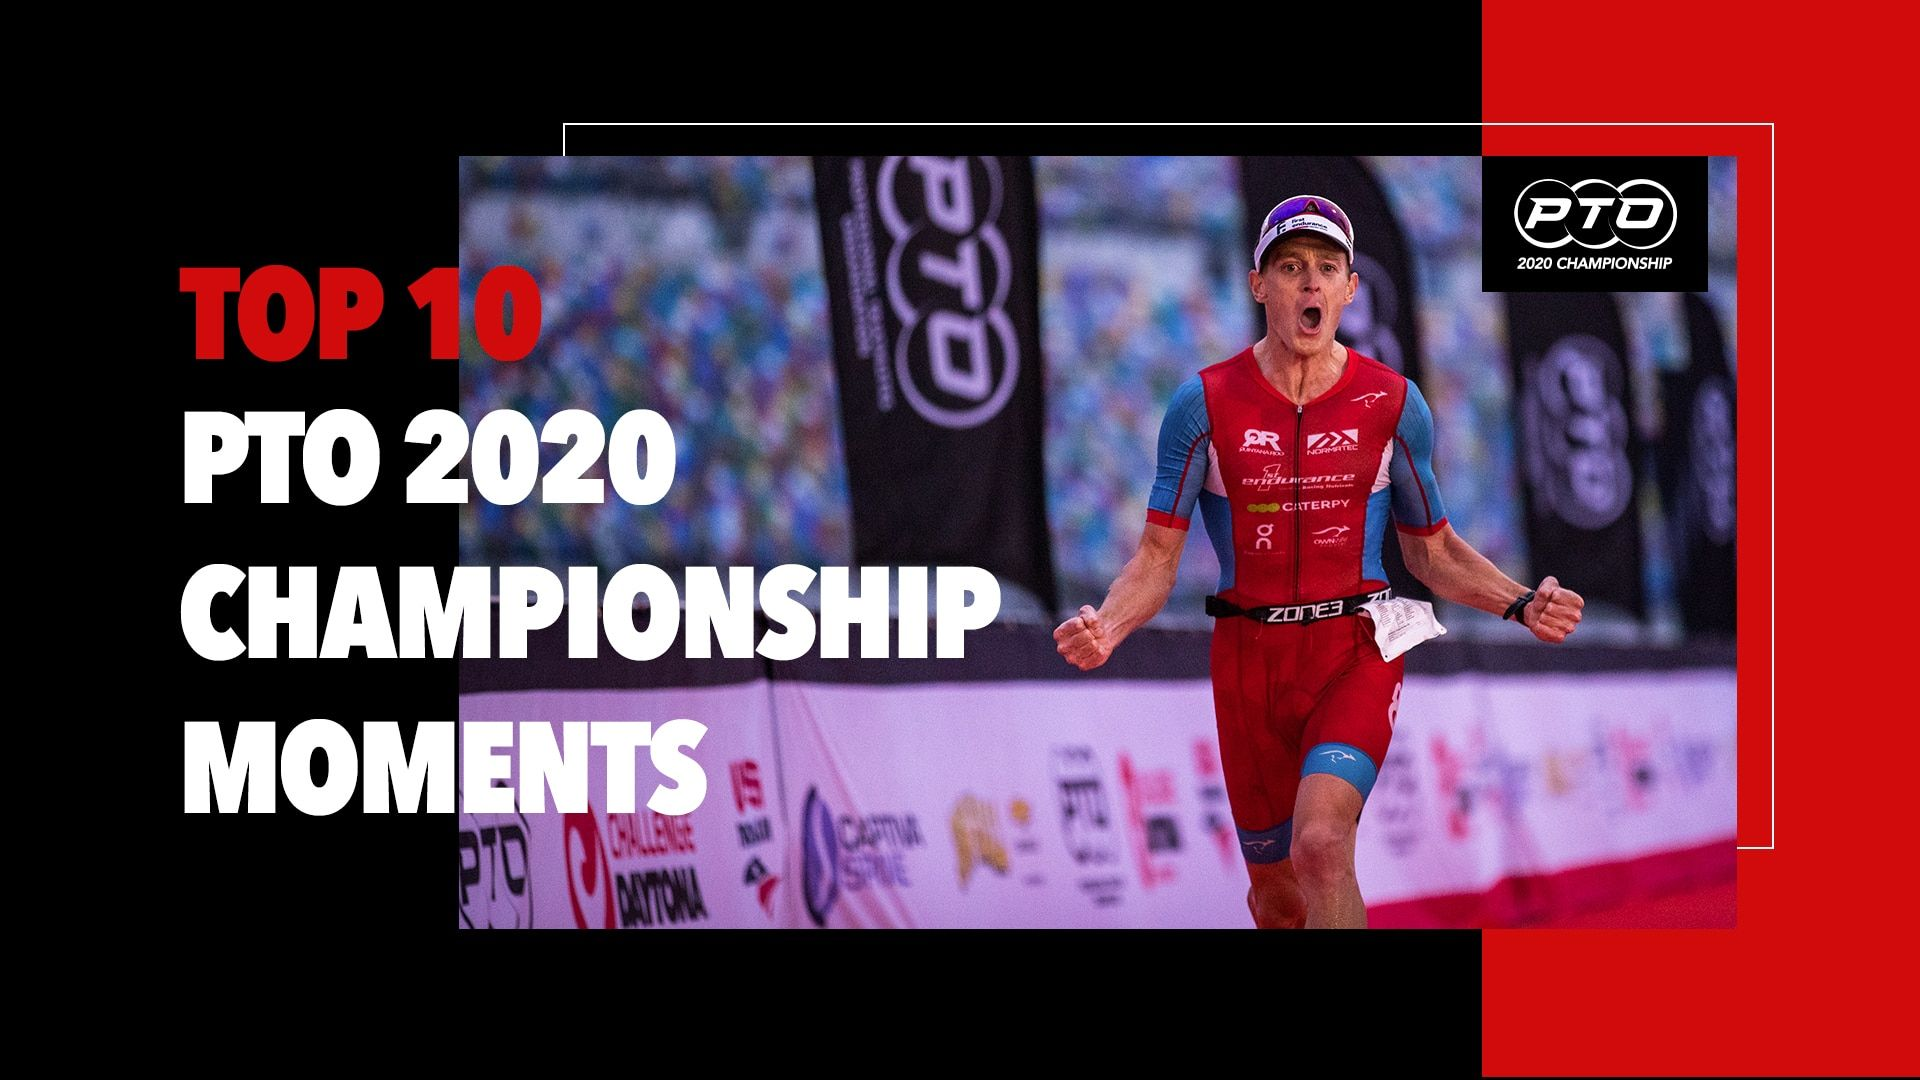 Top 10 Triathlon Moments: PTO 2020 Championship at CHALLENGEDAYTONA